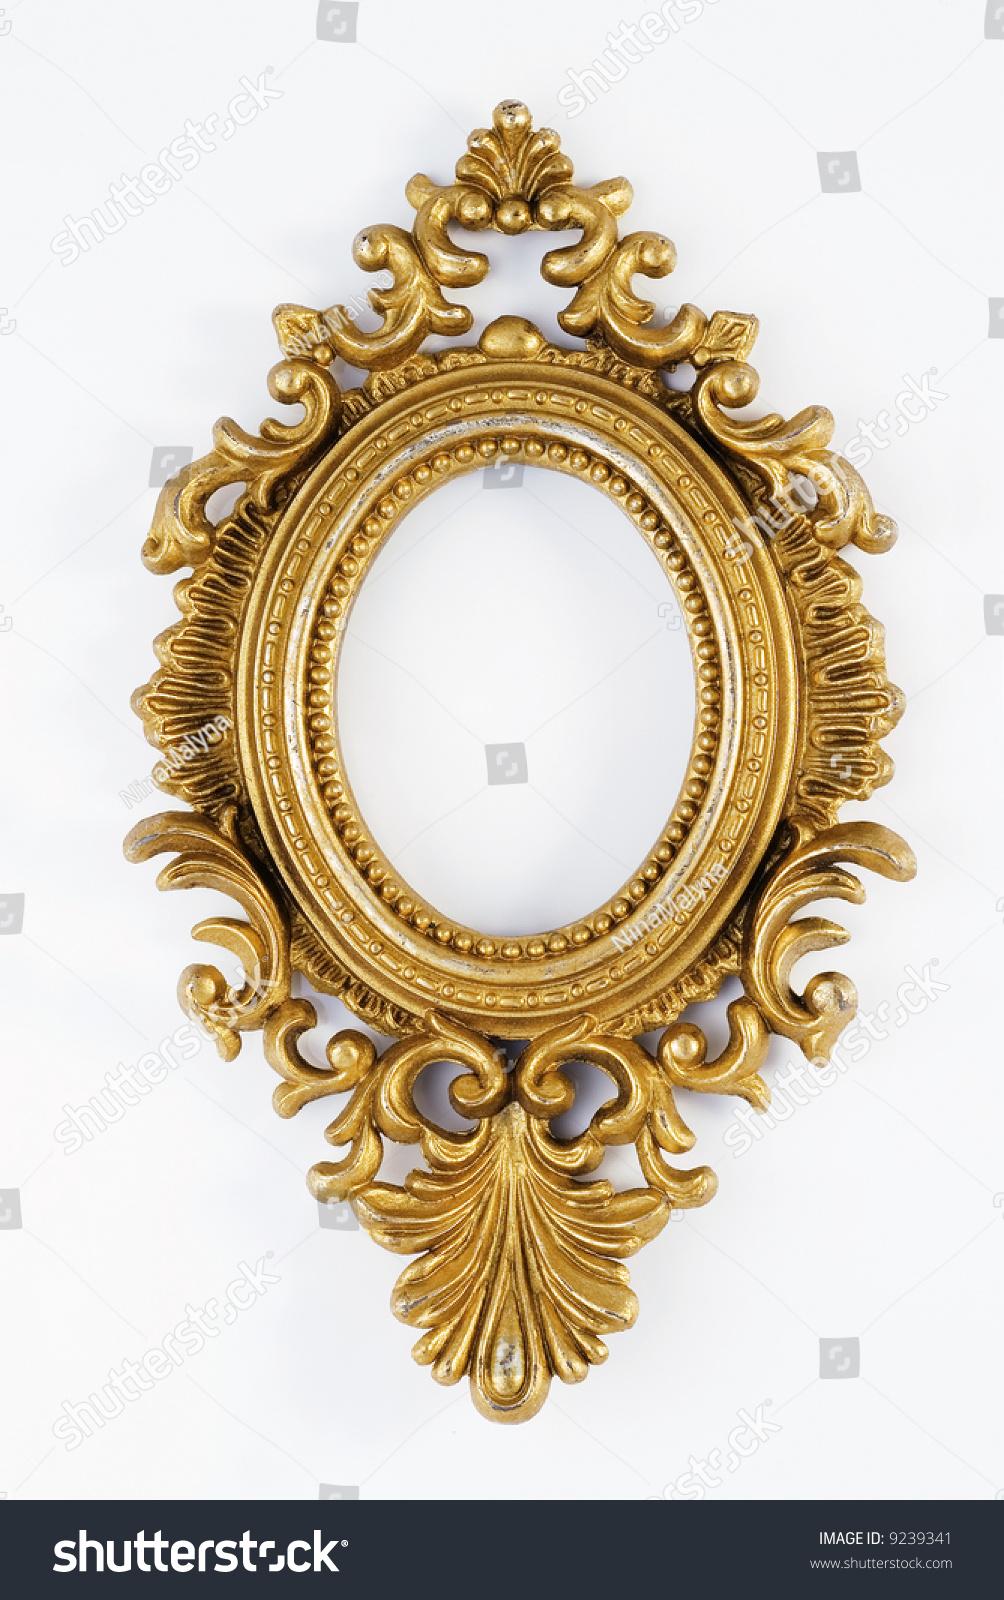 Gold Ornate Oval Frame Stock Photo (Royalty Free) 9239341 - Shutterstock